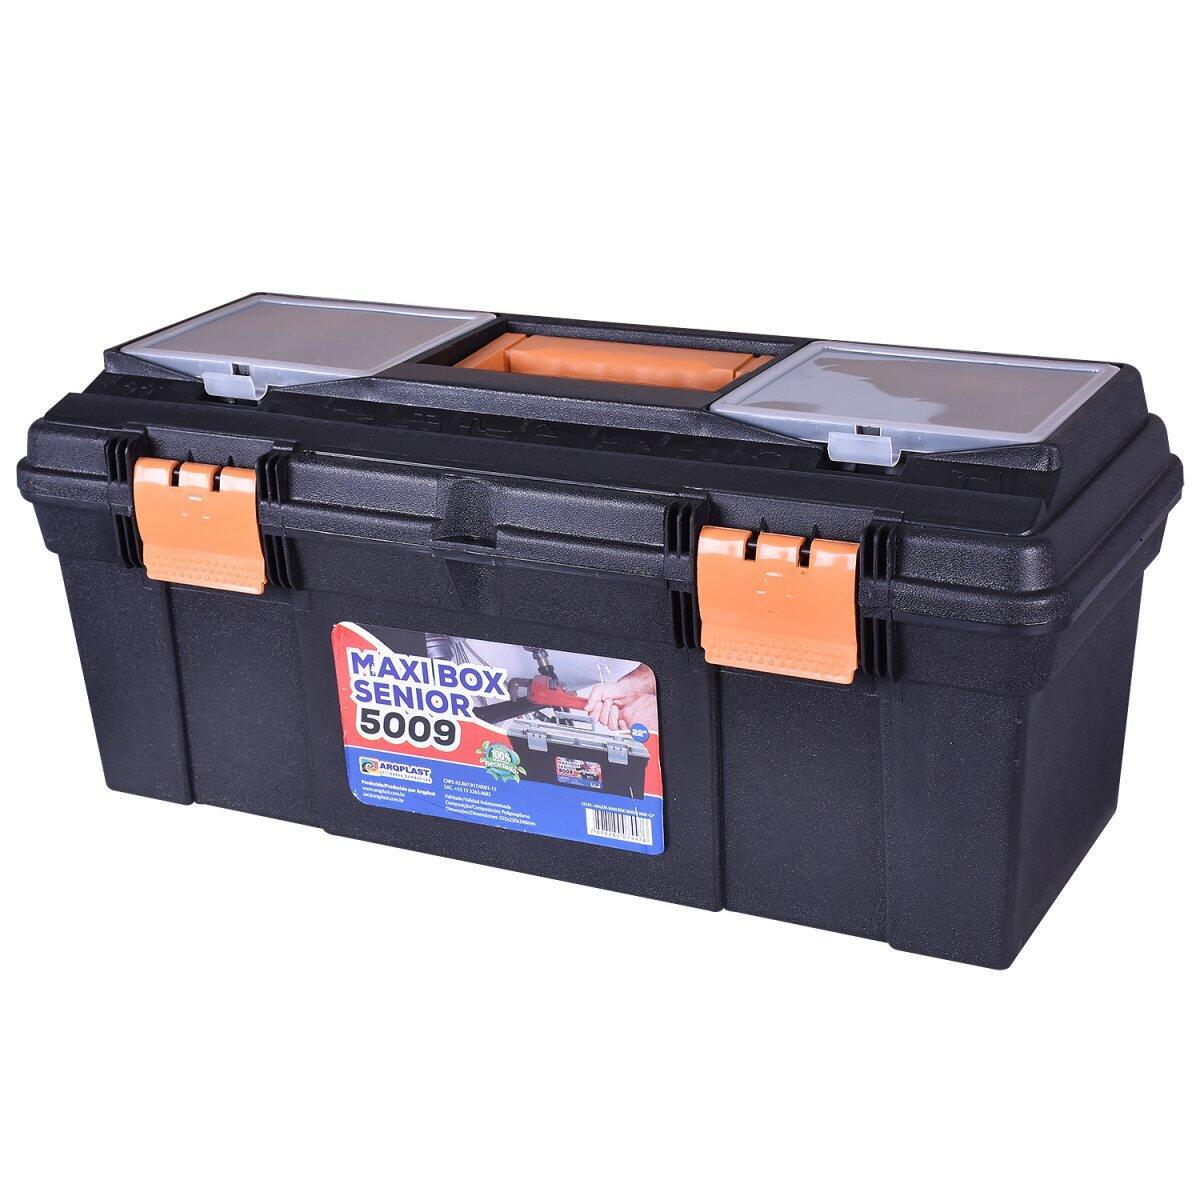 Maleta de Ferramentas Maxi Box Senior 5009 Bumafer